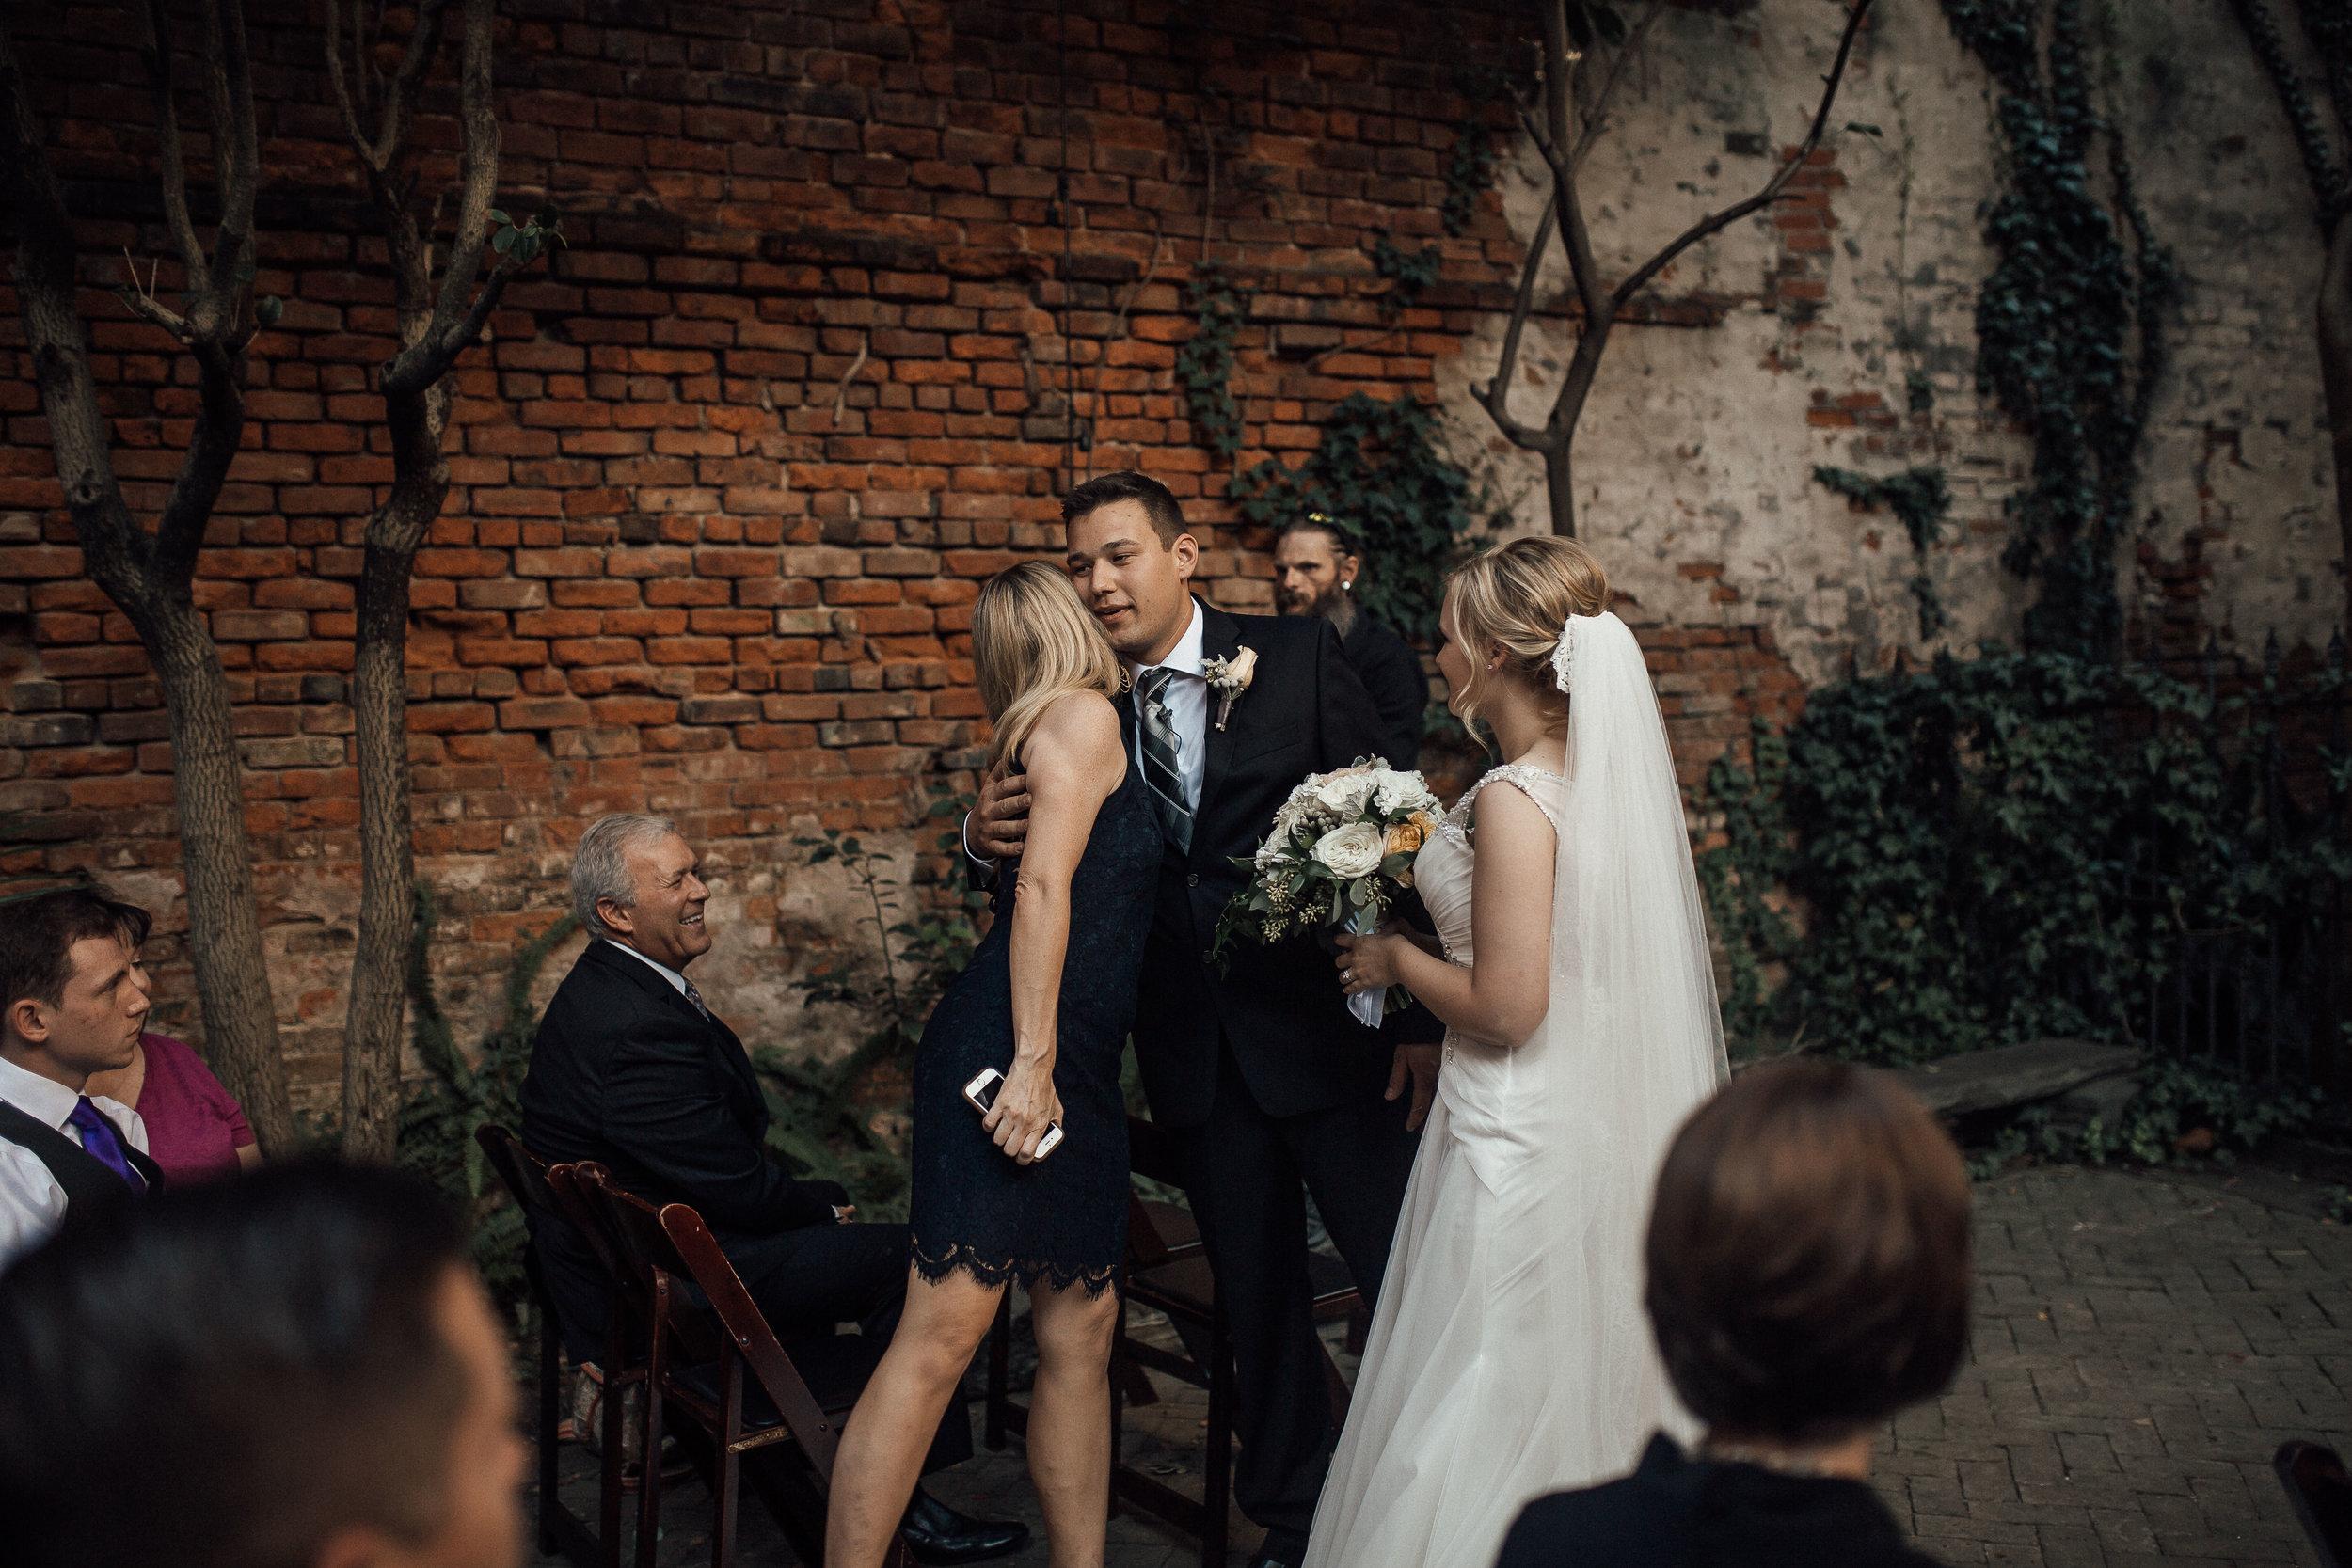 new-orleans-pharmacy-museum-new-orleans-wedding-cassie-cook-photography-vargo-387.jpg